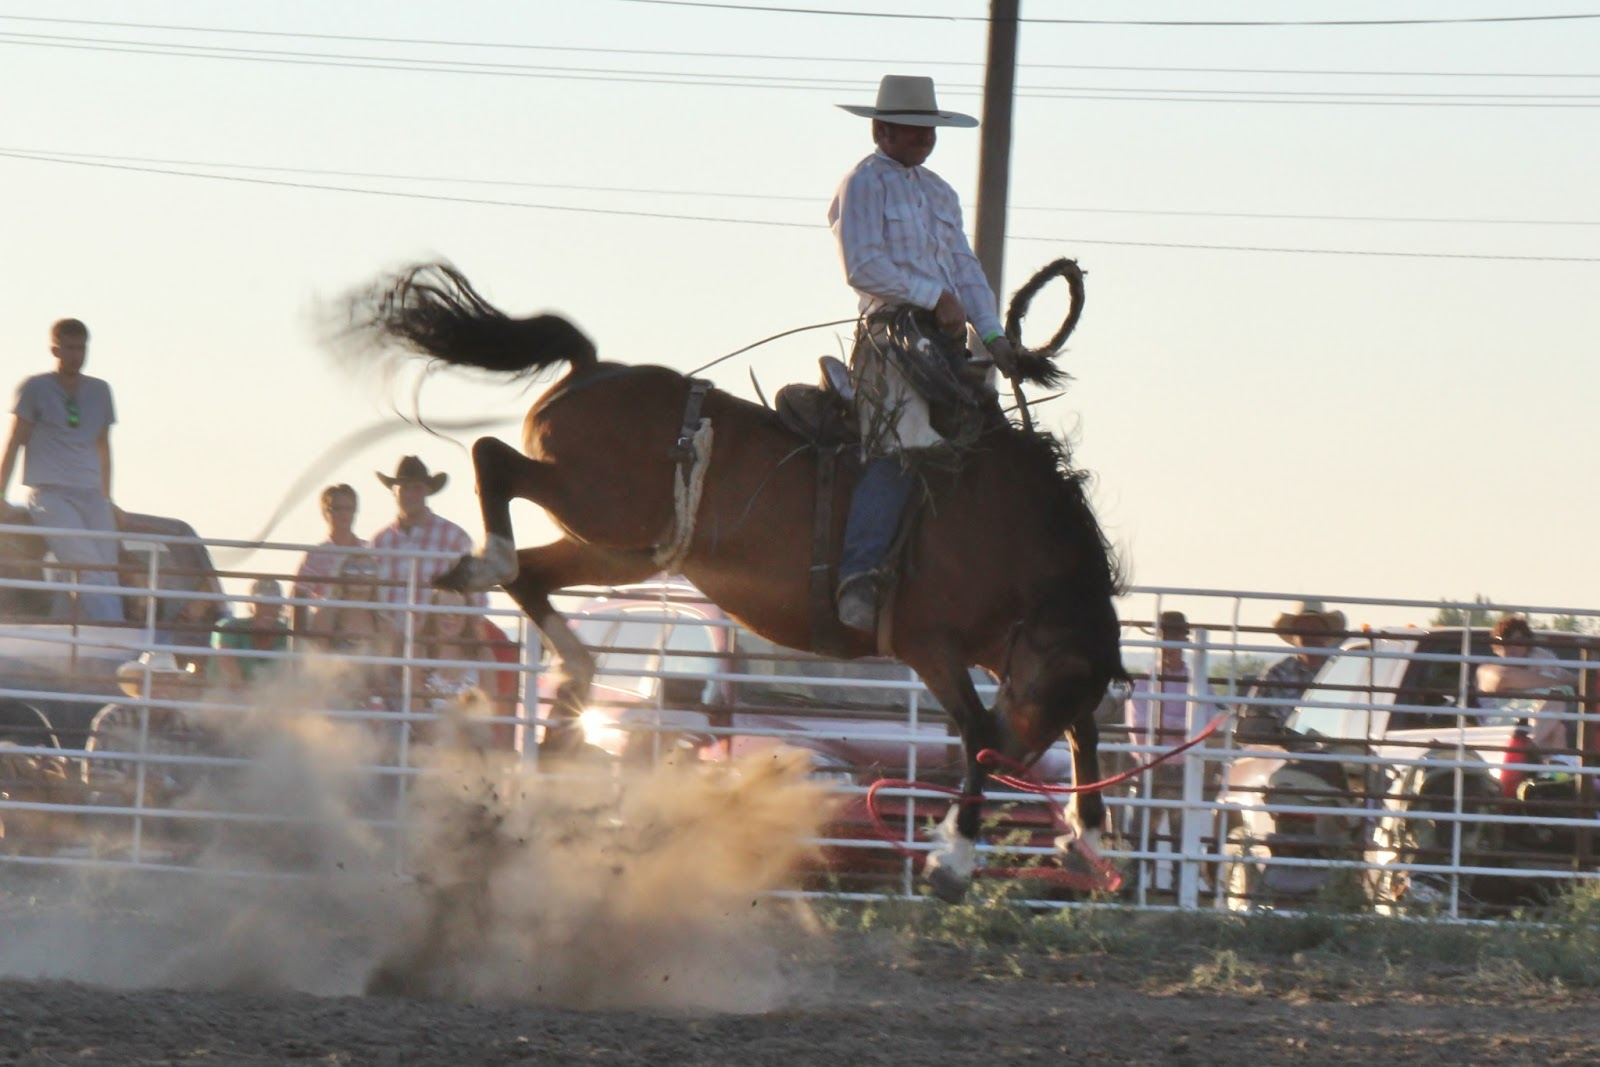 Wyocowboyphotography Ranch Broncs